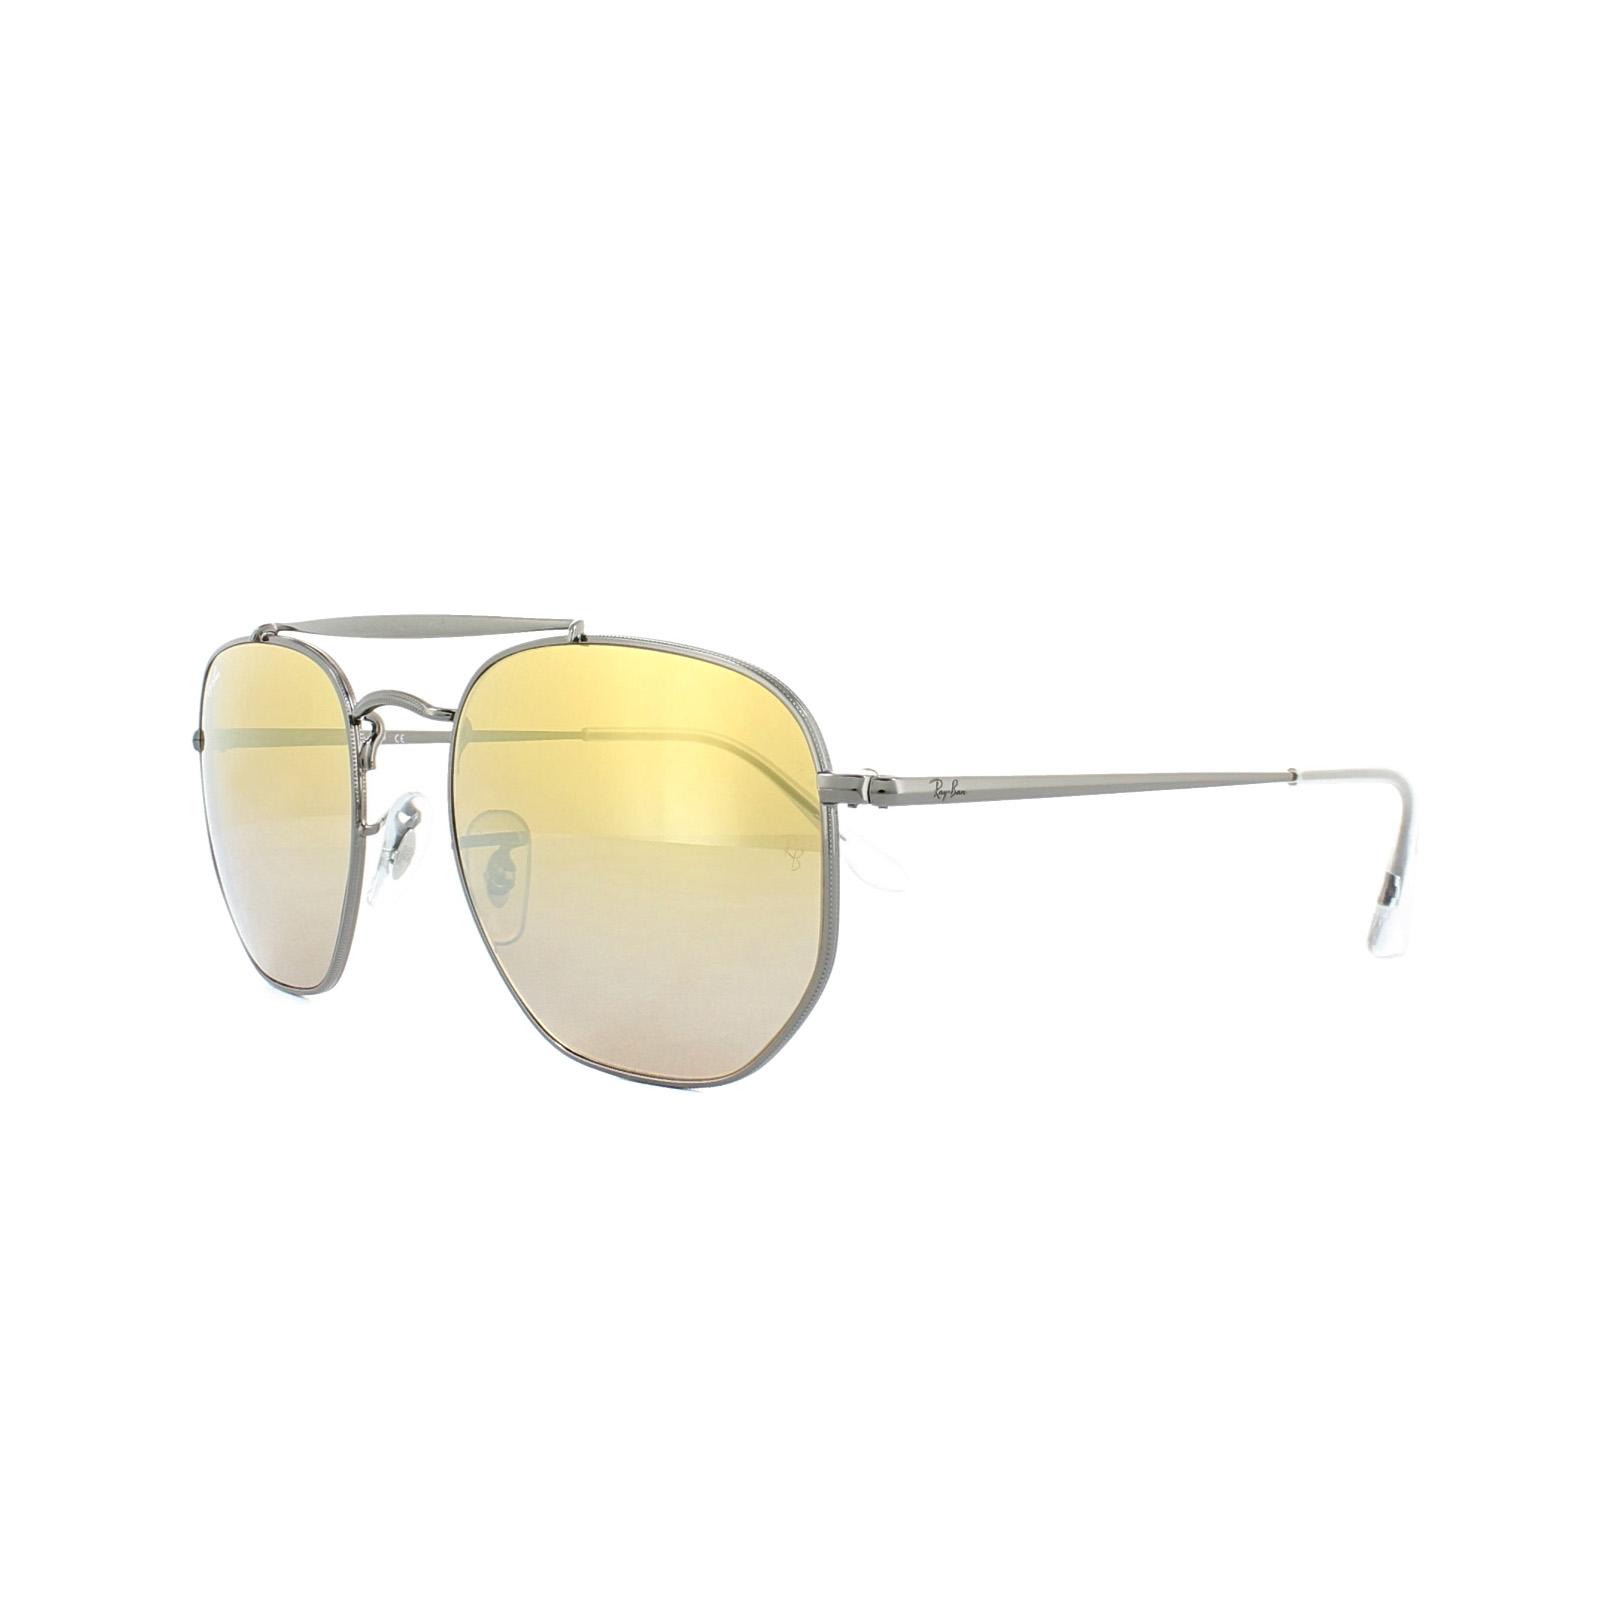 aa59a337c1 Ray-Ban Sunglasses Marshal 3648 004 I3 Gunmetal Brown Gradient ...